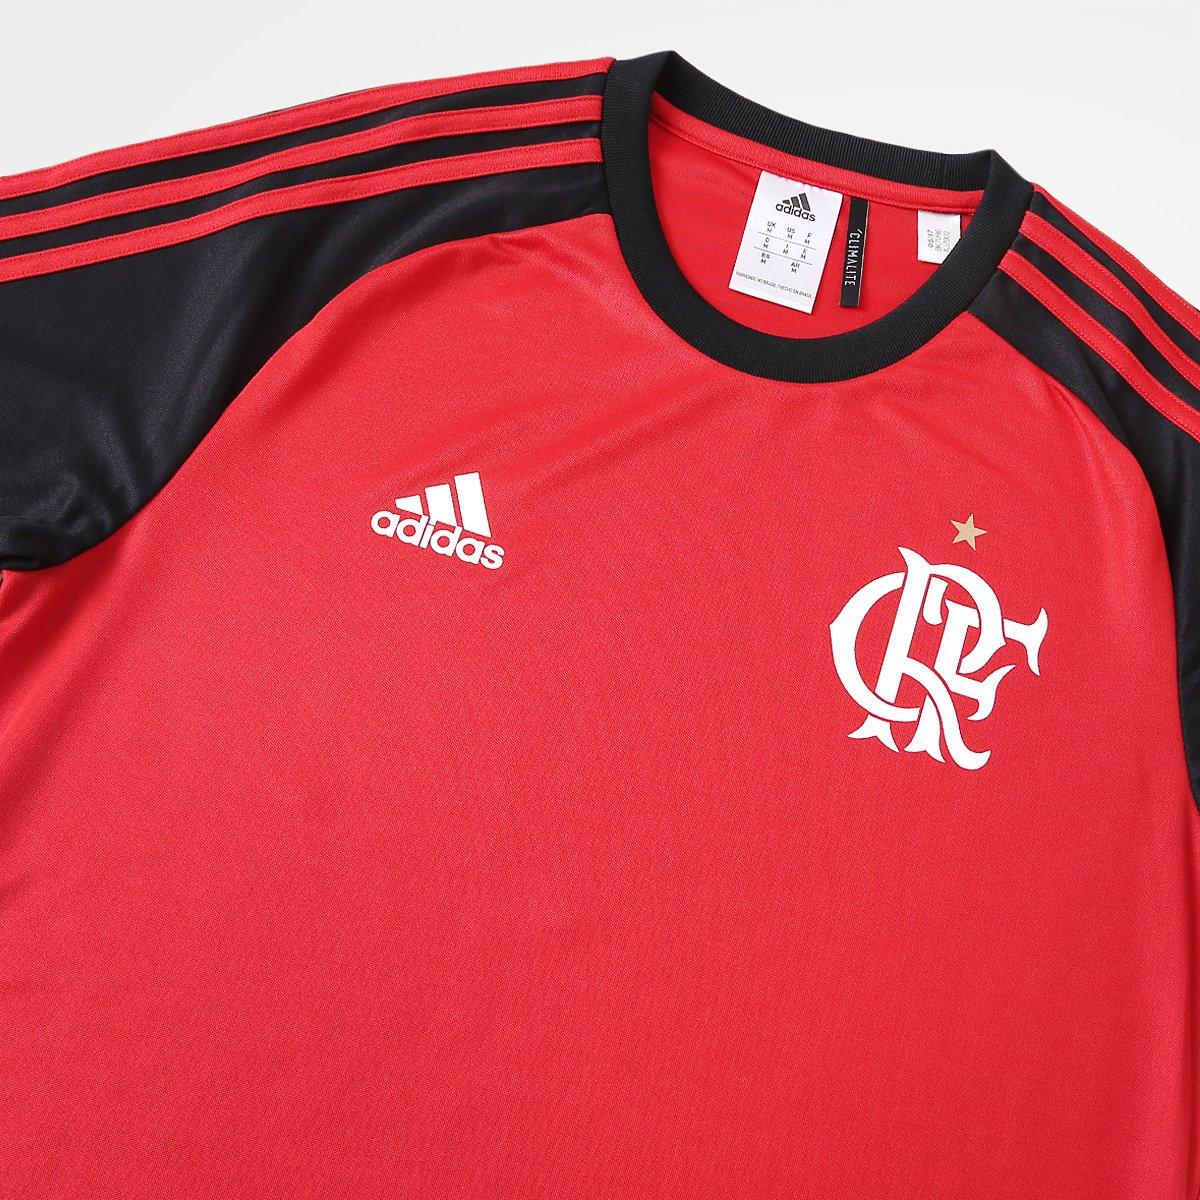 f71968e640 Camisa Flamengo I 17 18 Réplica Torcedor Adidas Masculina - Compre ...